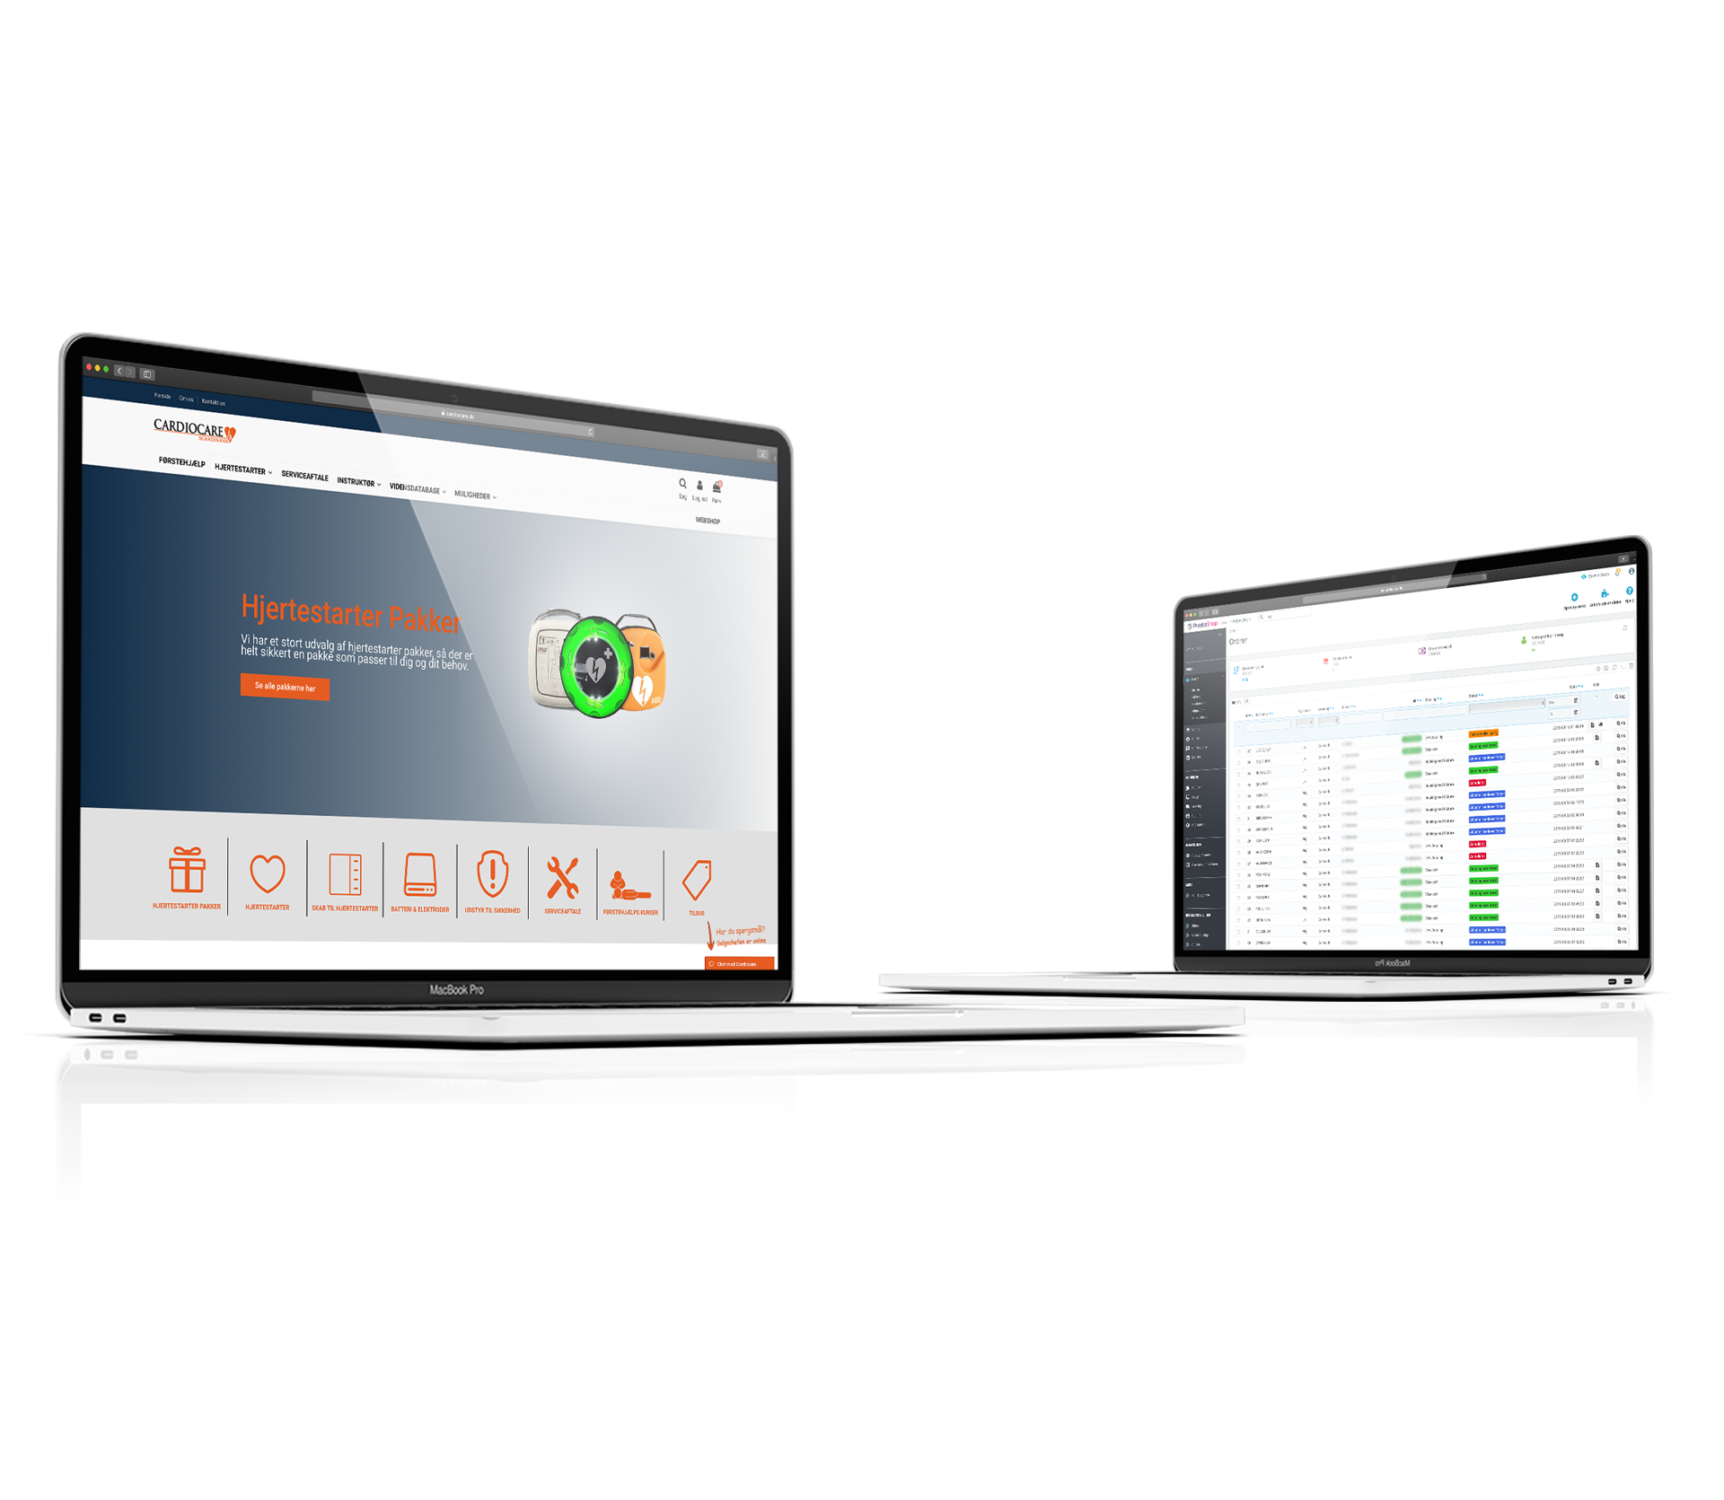 SideWalk-Services-Webshops-Cardiocare